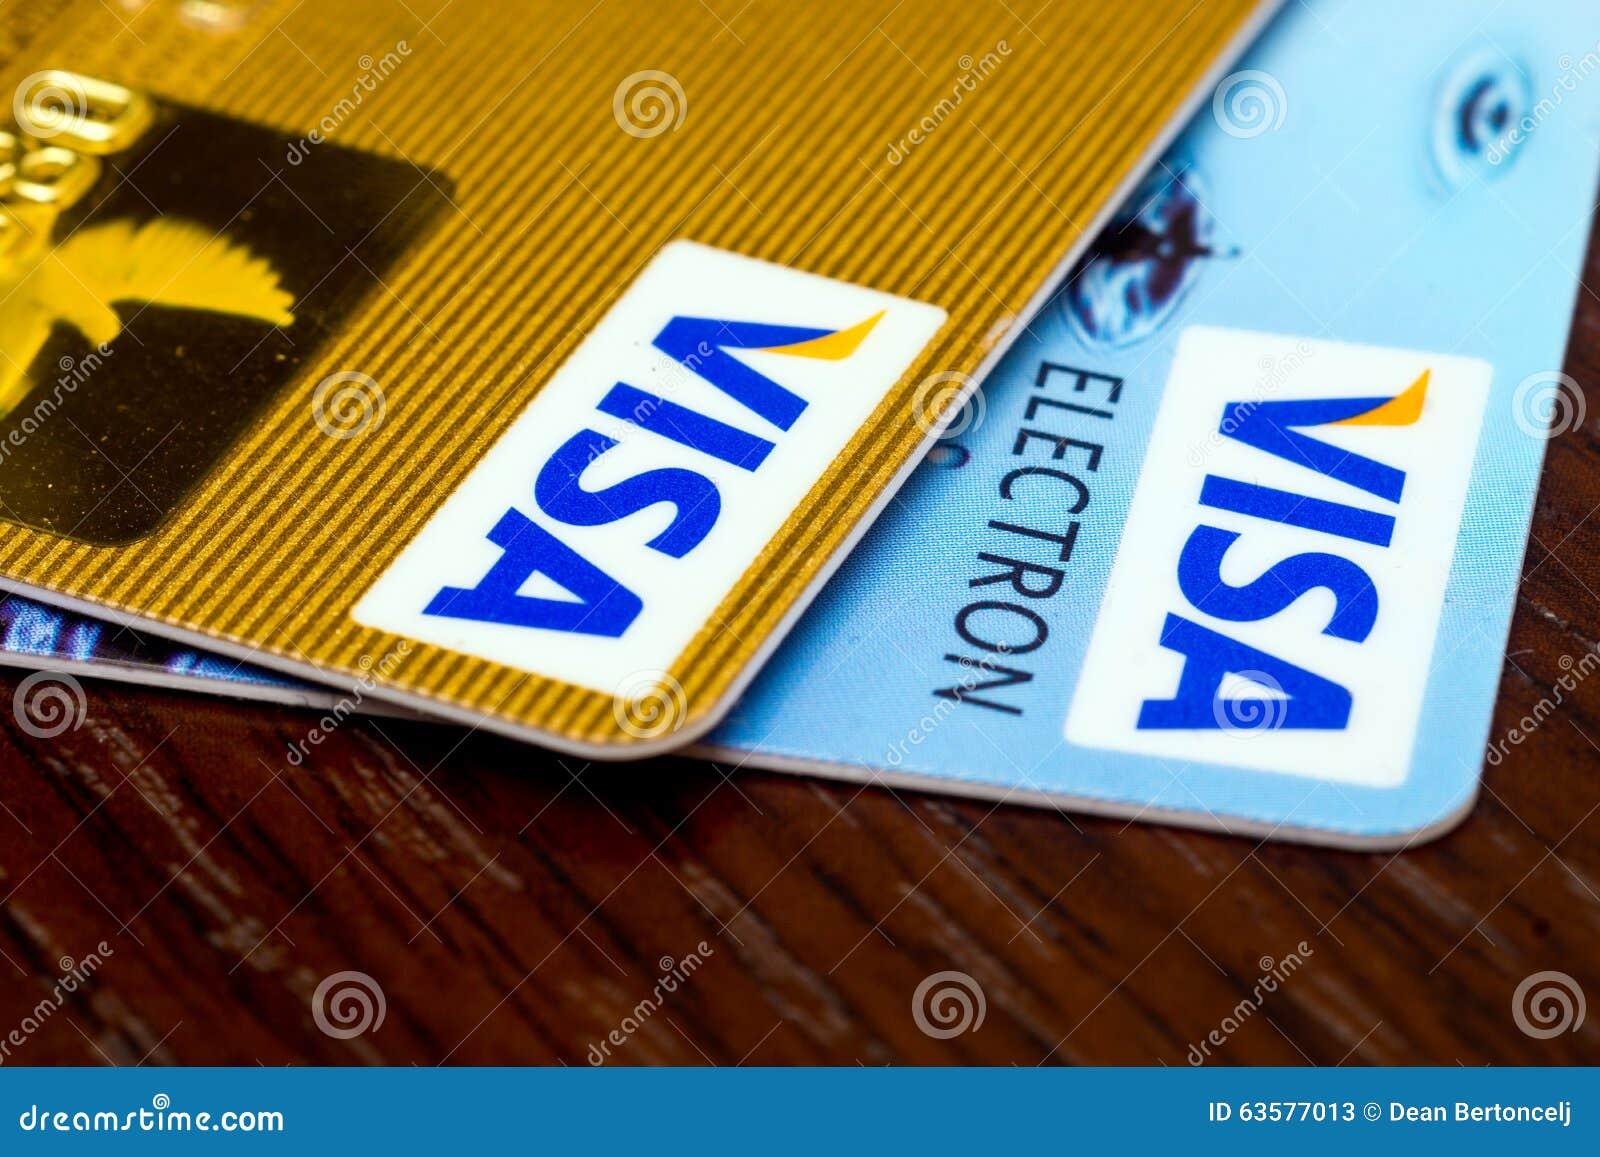 Visa credit cards editorial stock photo image of debt 63577013 visa credit cards editorial stock photo biocorpaavc Choice Image